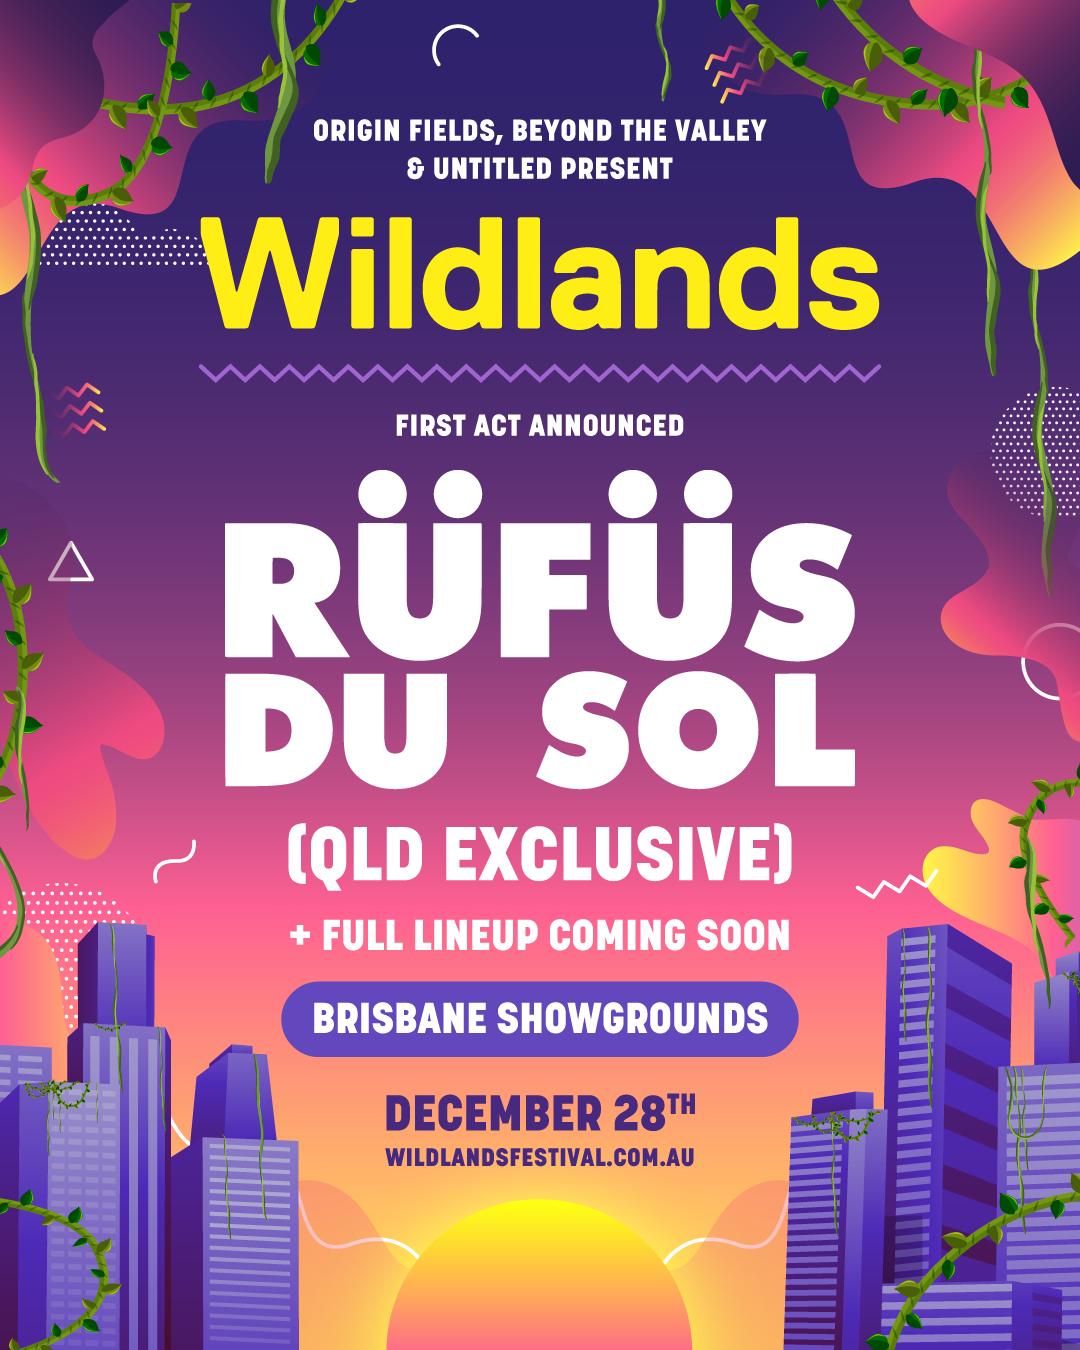 Wildlands-poster-withRDS.png